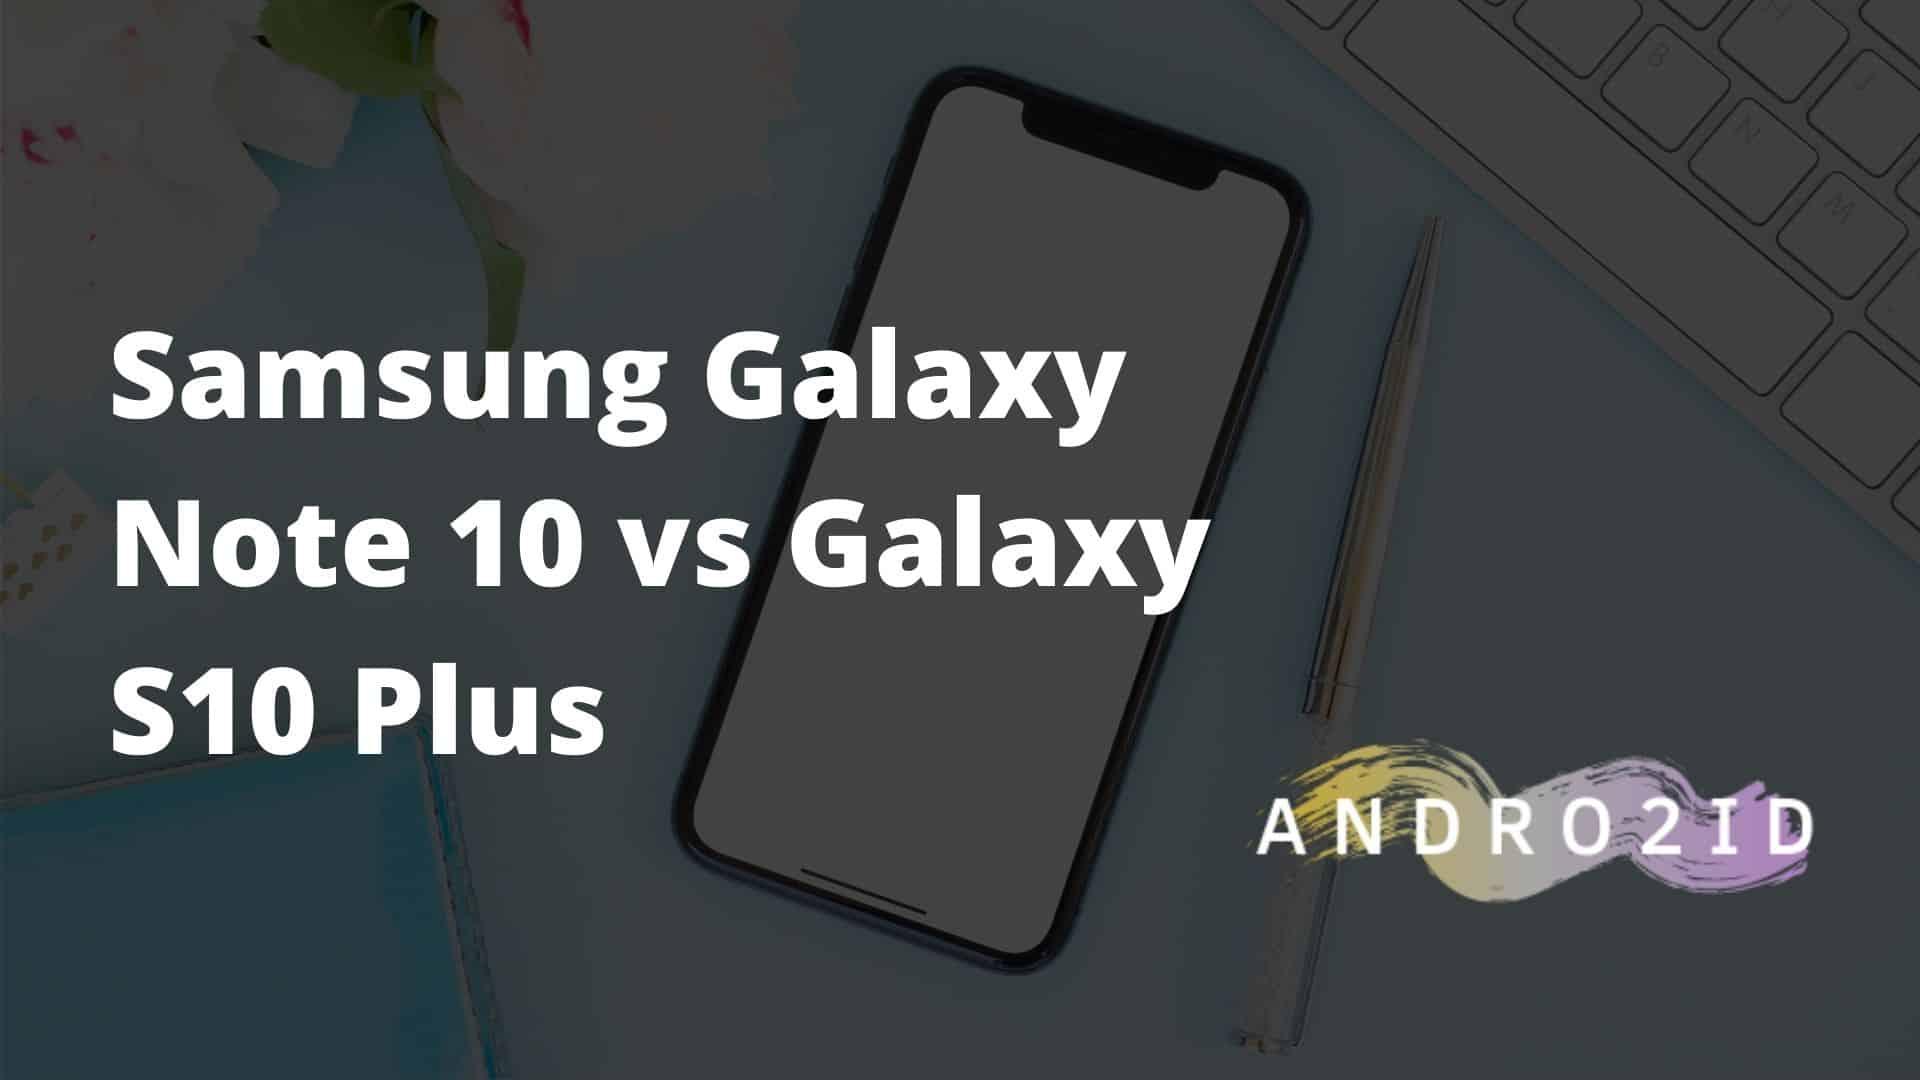 Samsung Galaxy Note 10 vs Galaxy S10 Plus